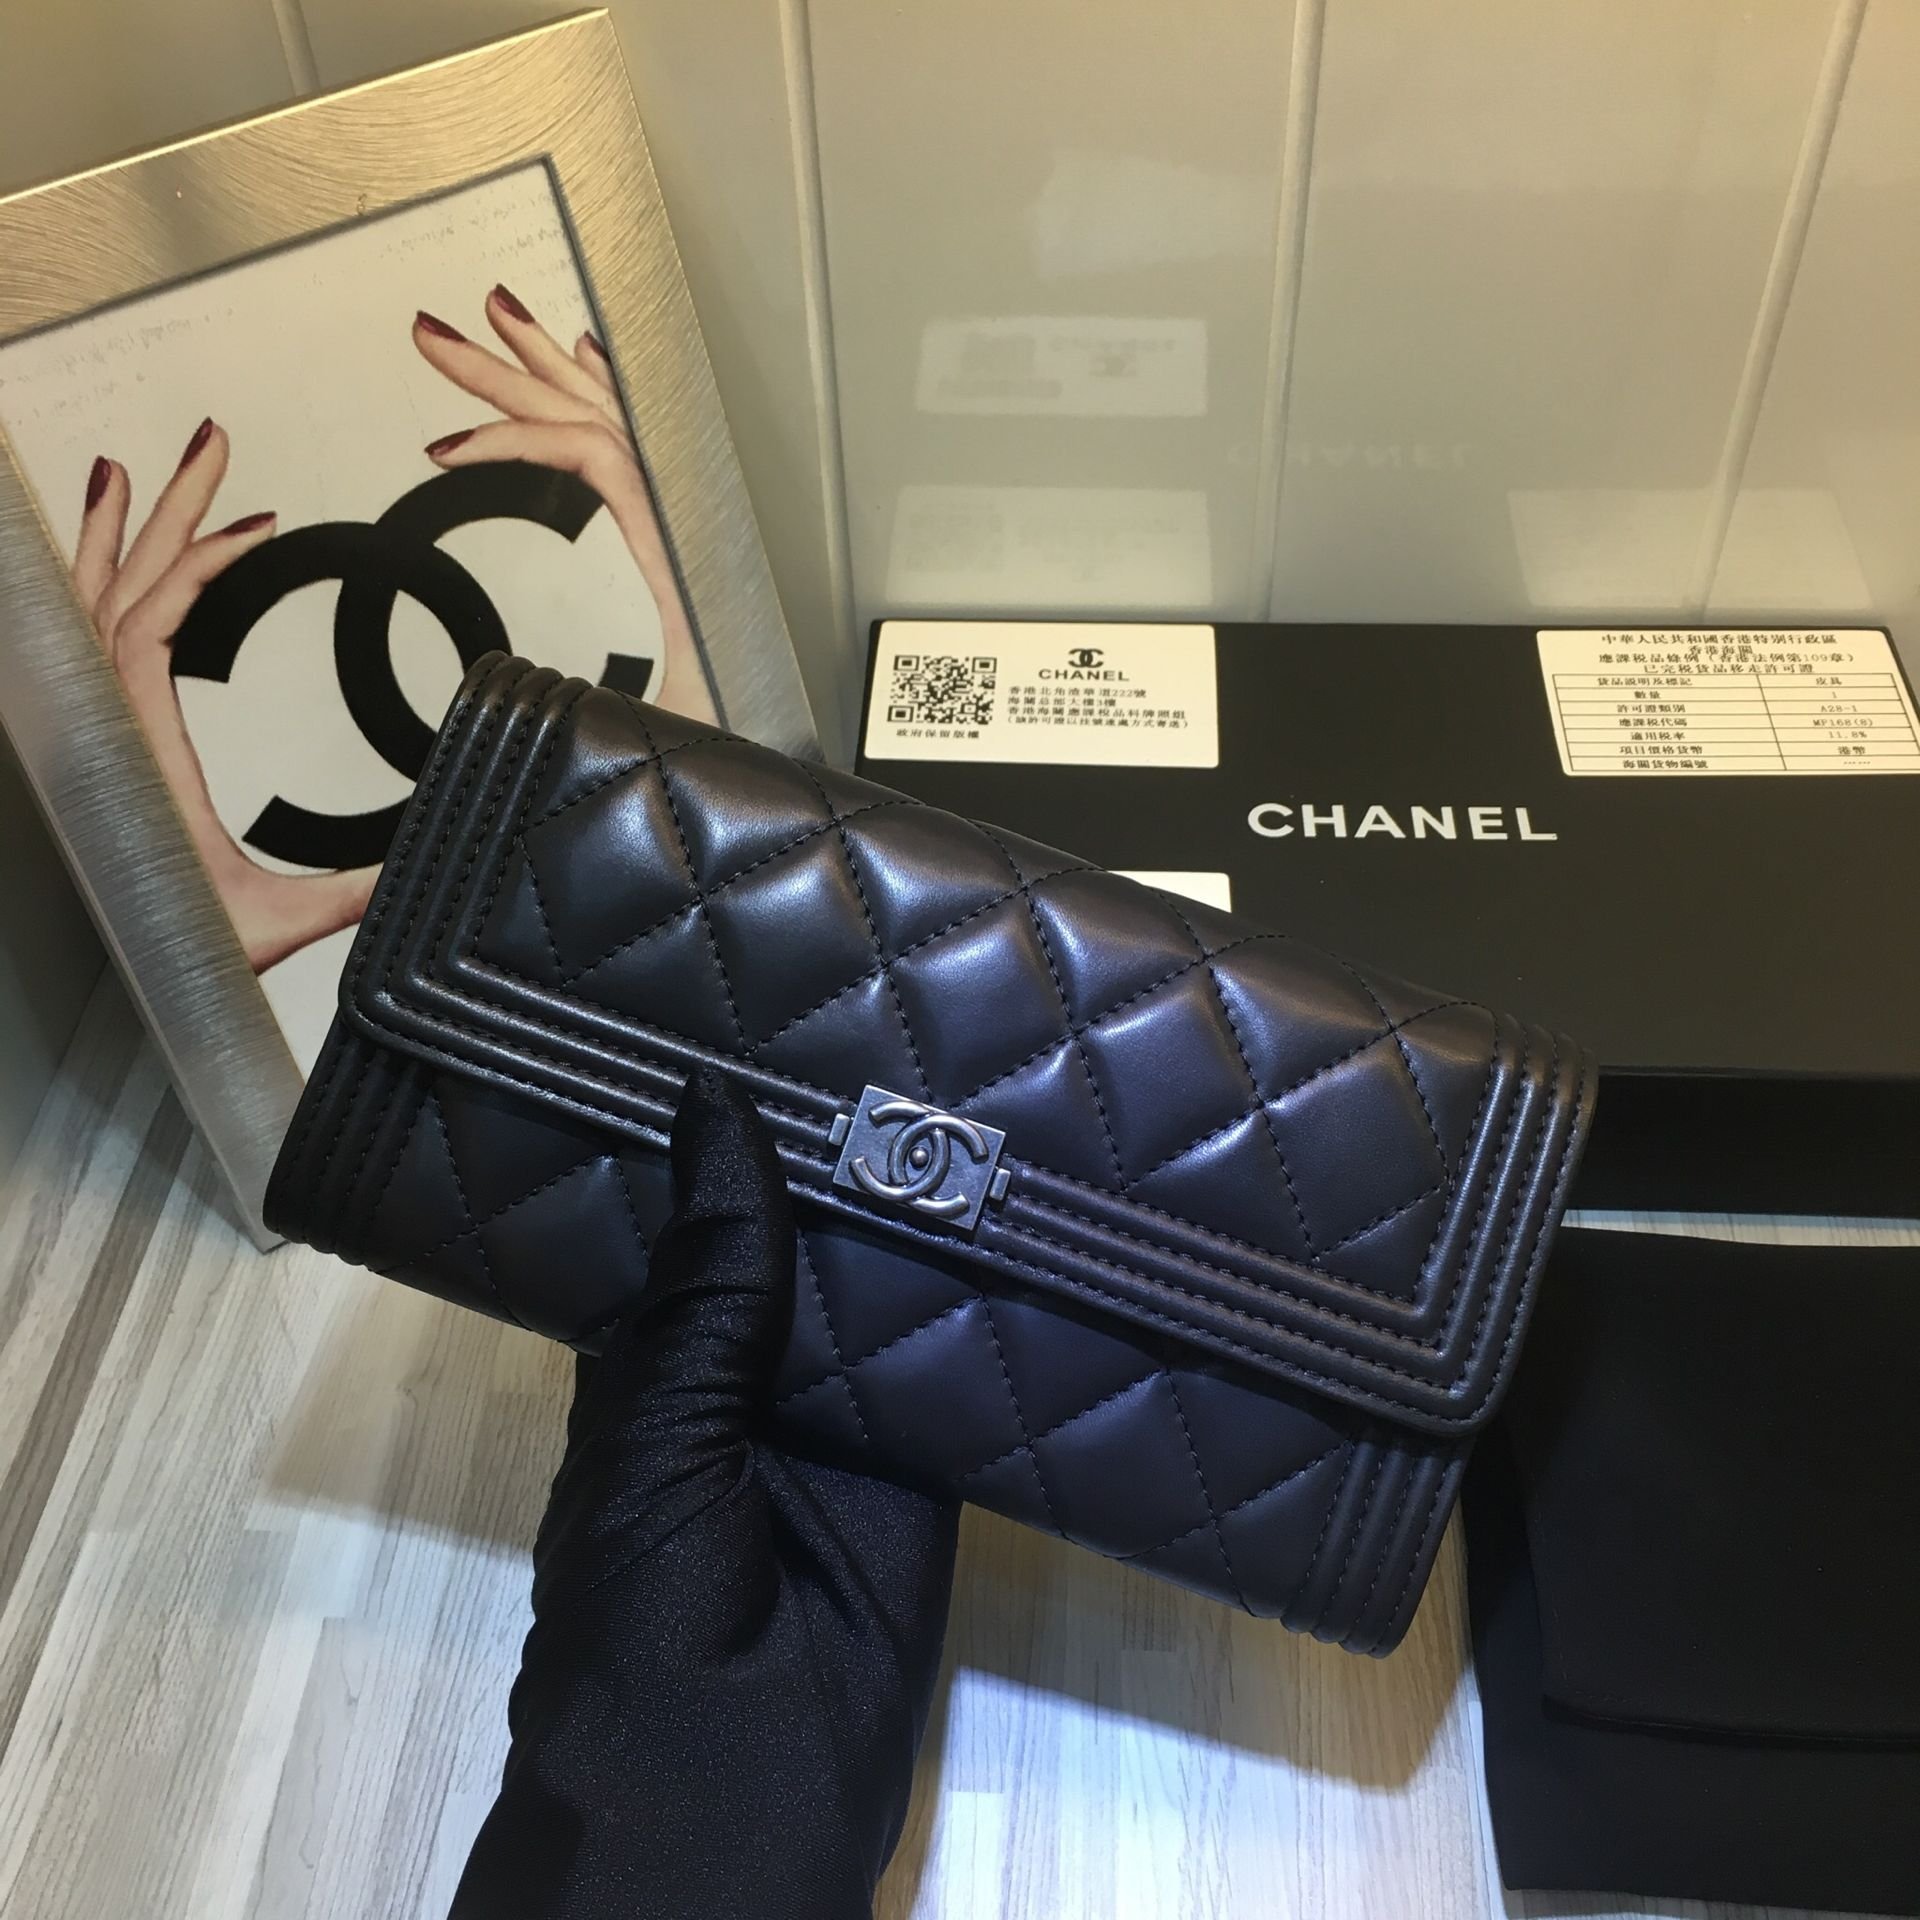 Chanel leboy Matelasse Long Wallet  Leather 11245 black